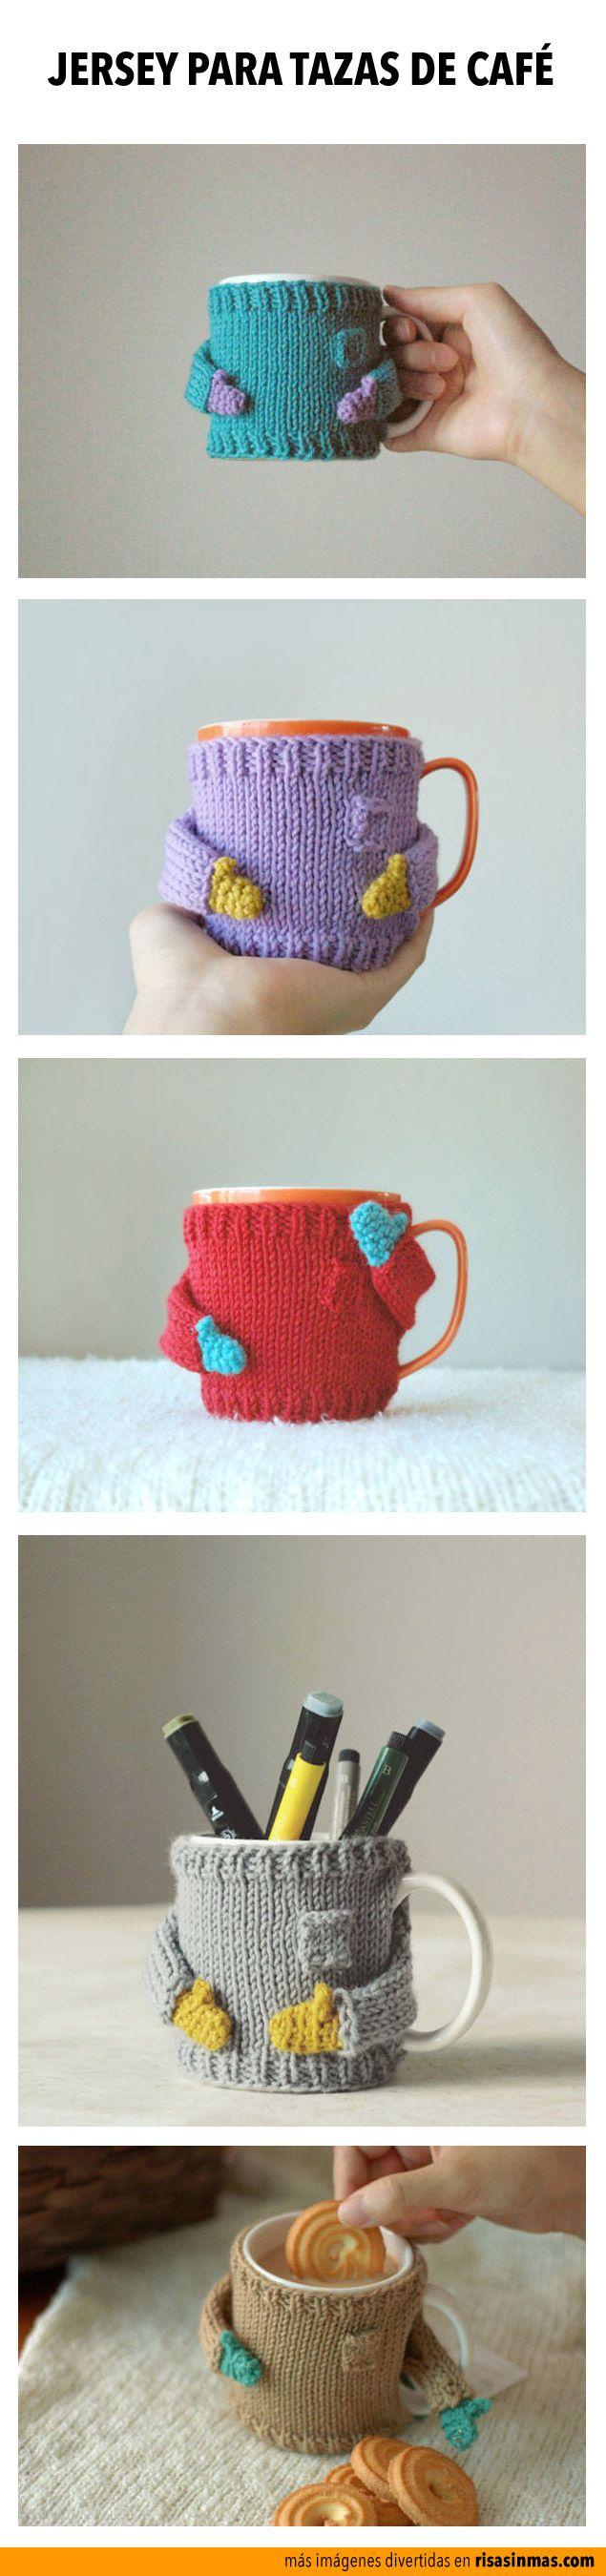 cute mug cozy!